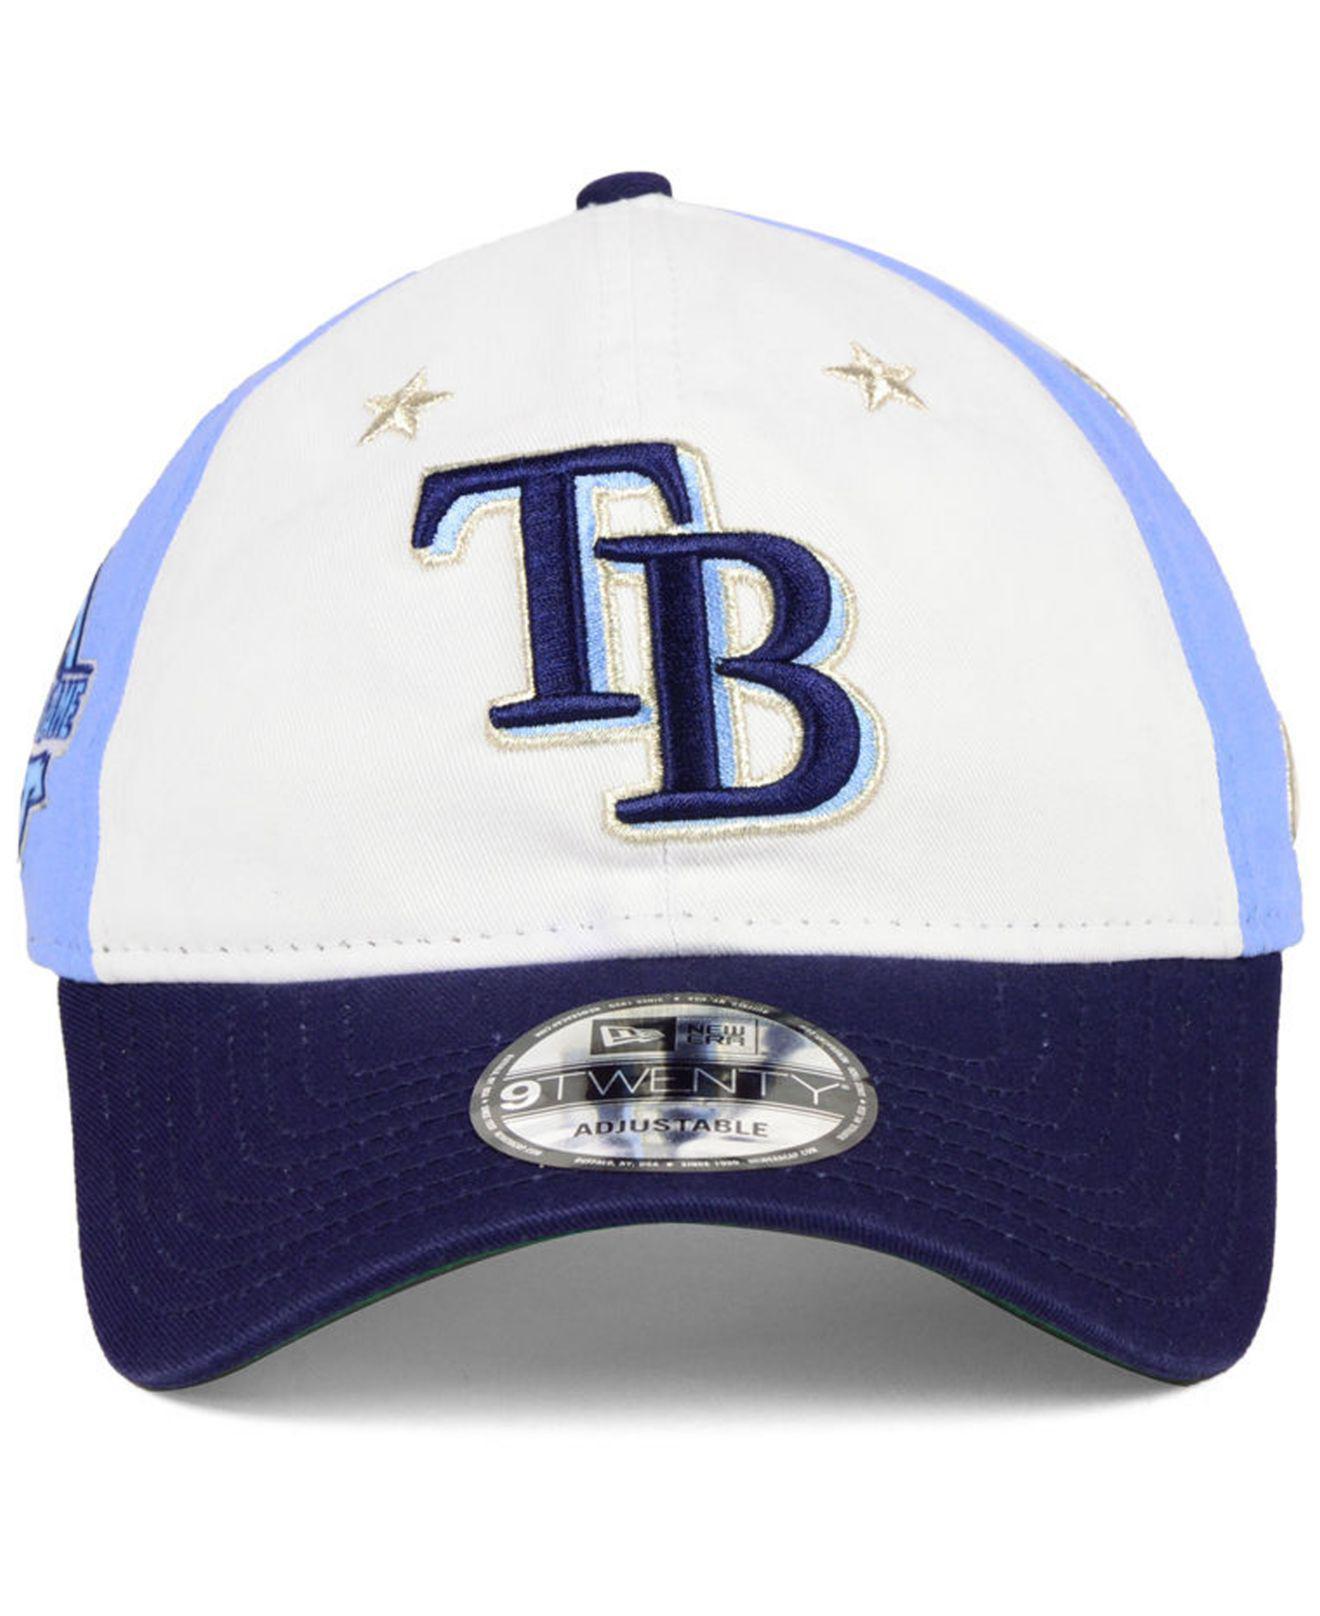 buy online 30457 d1ad6 Lyst - KTZ Tampa Bay Rays All Star Game 9twenty Strapback Cap 2018 in Blue  for Men